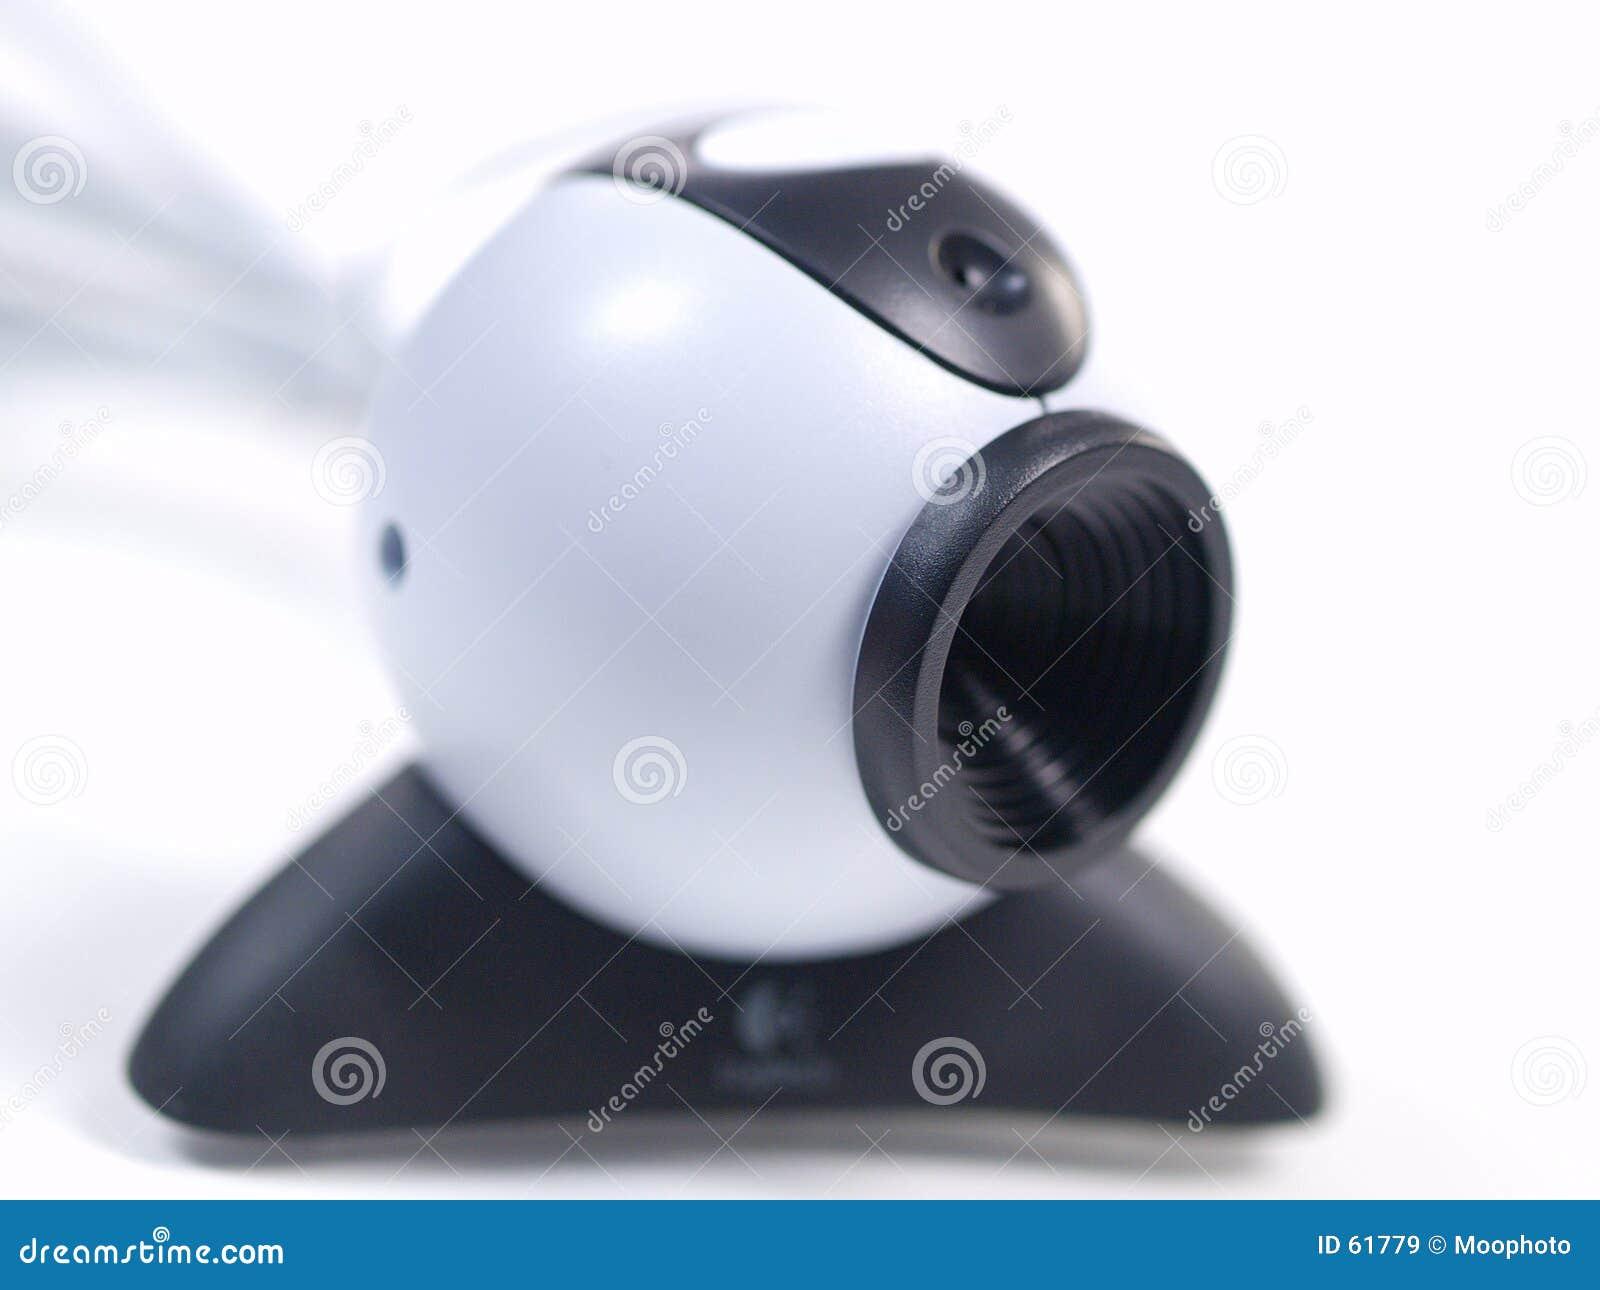 Kamera internetowa standardowa